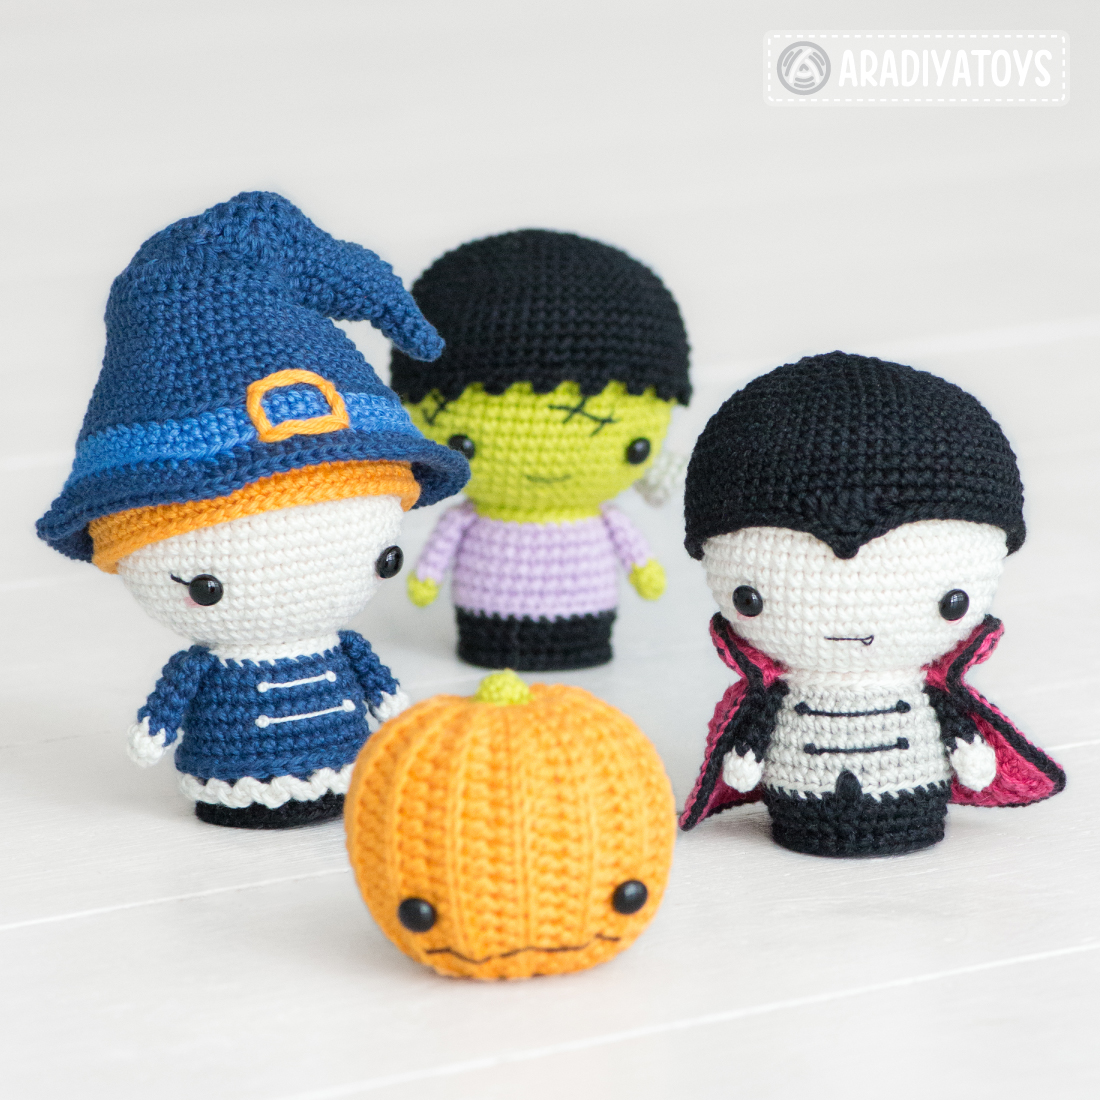 "Set d'Halloween Minis de la collection ""AradiyaToys Minis"""